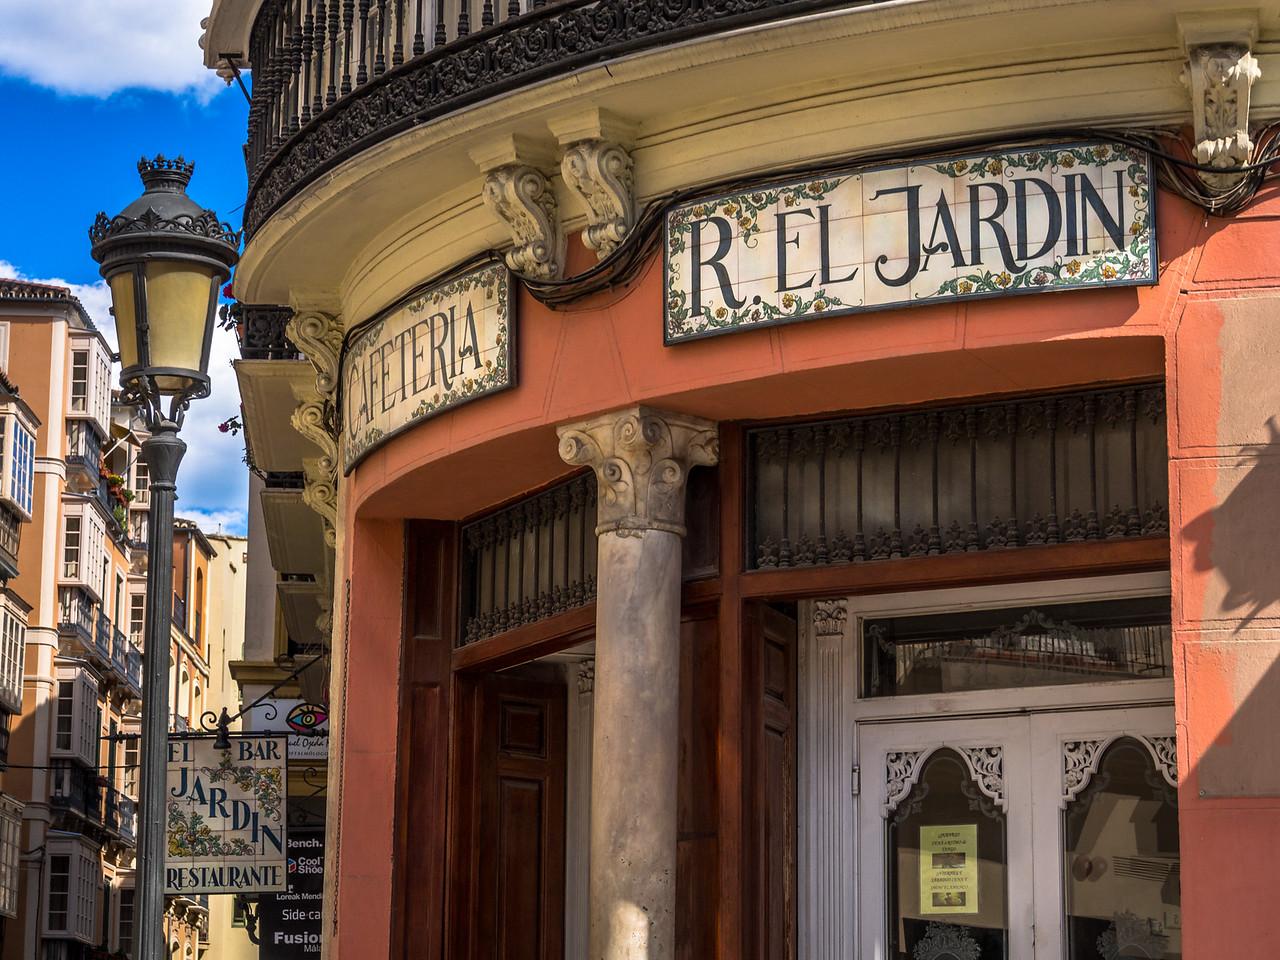 El Jardin, Calle Cister, Málaga